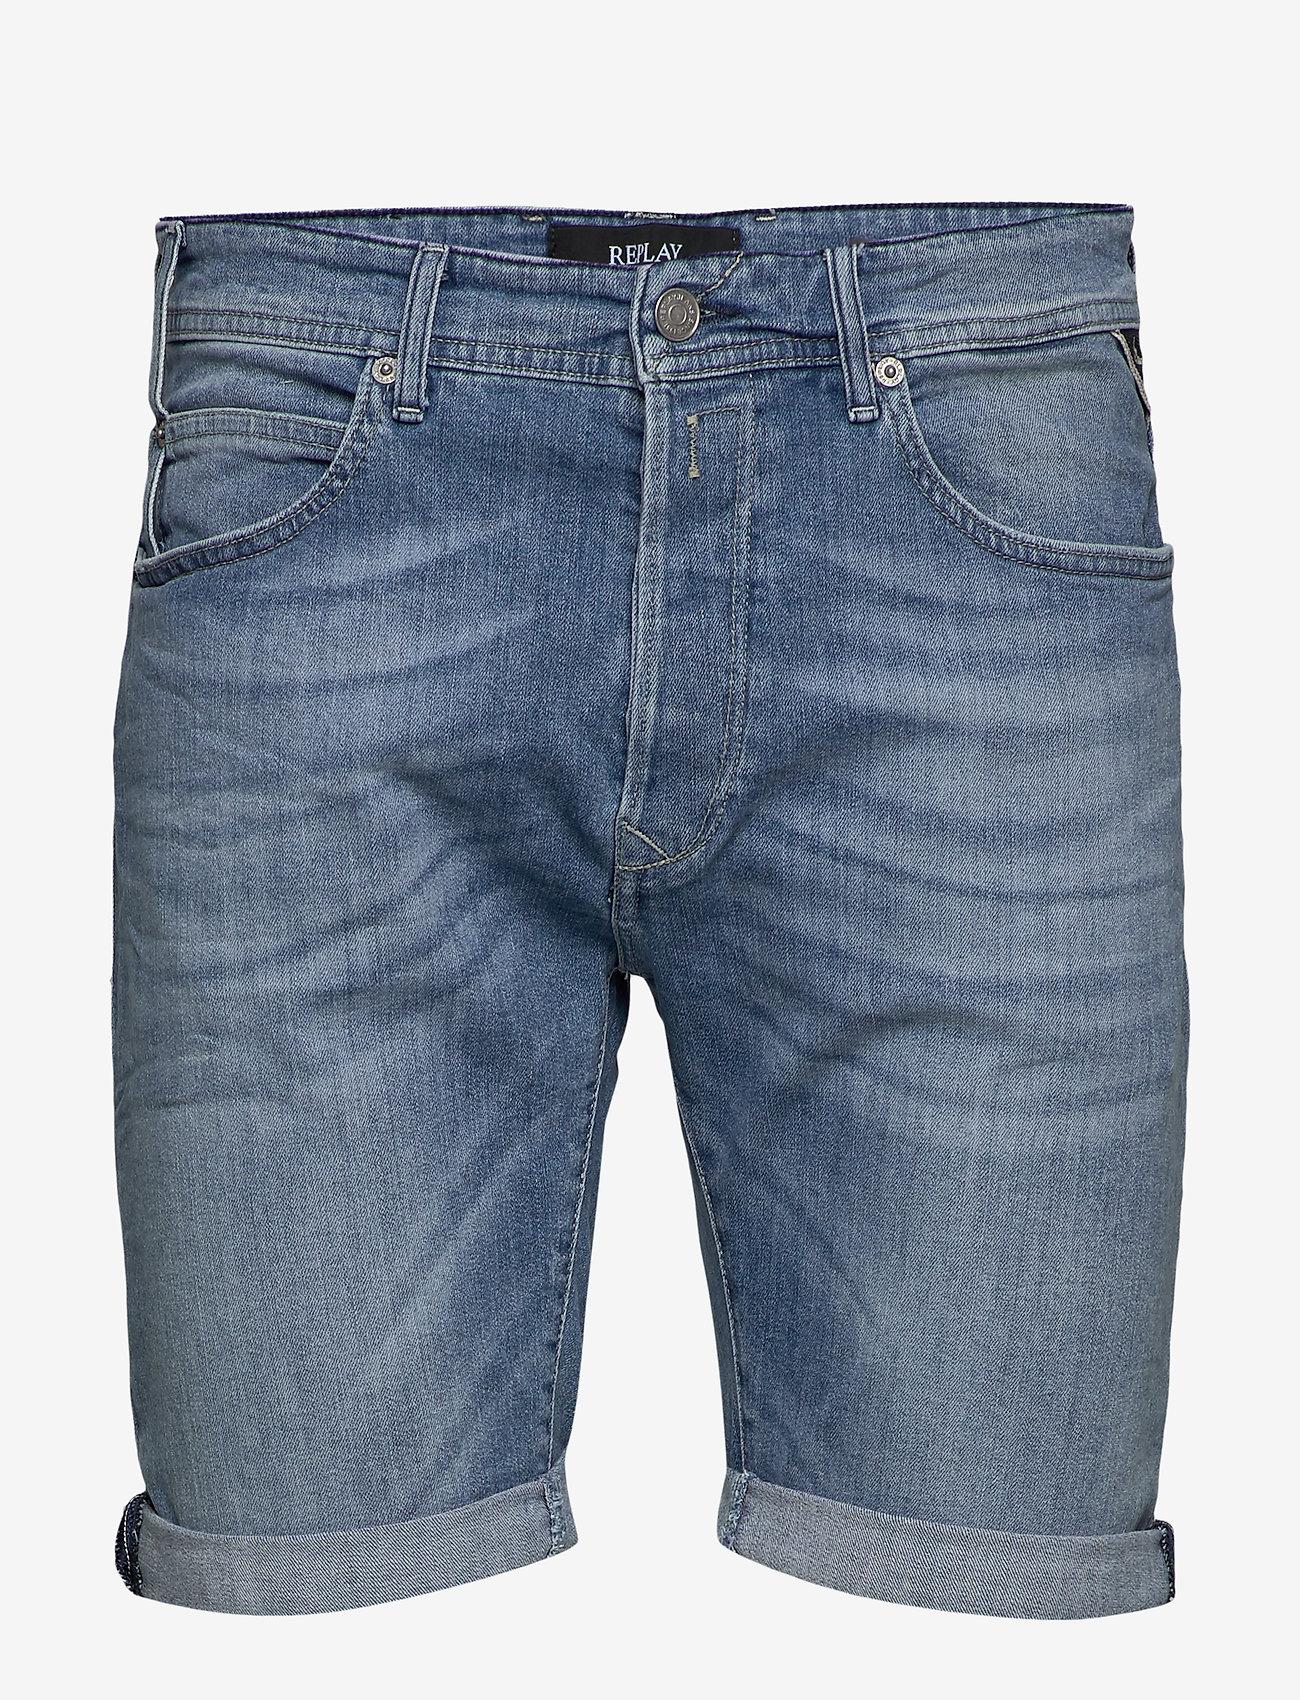 Replay - RBJ.901 SHORT - denim shorts - blue - 0